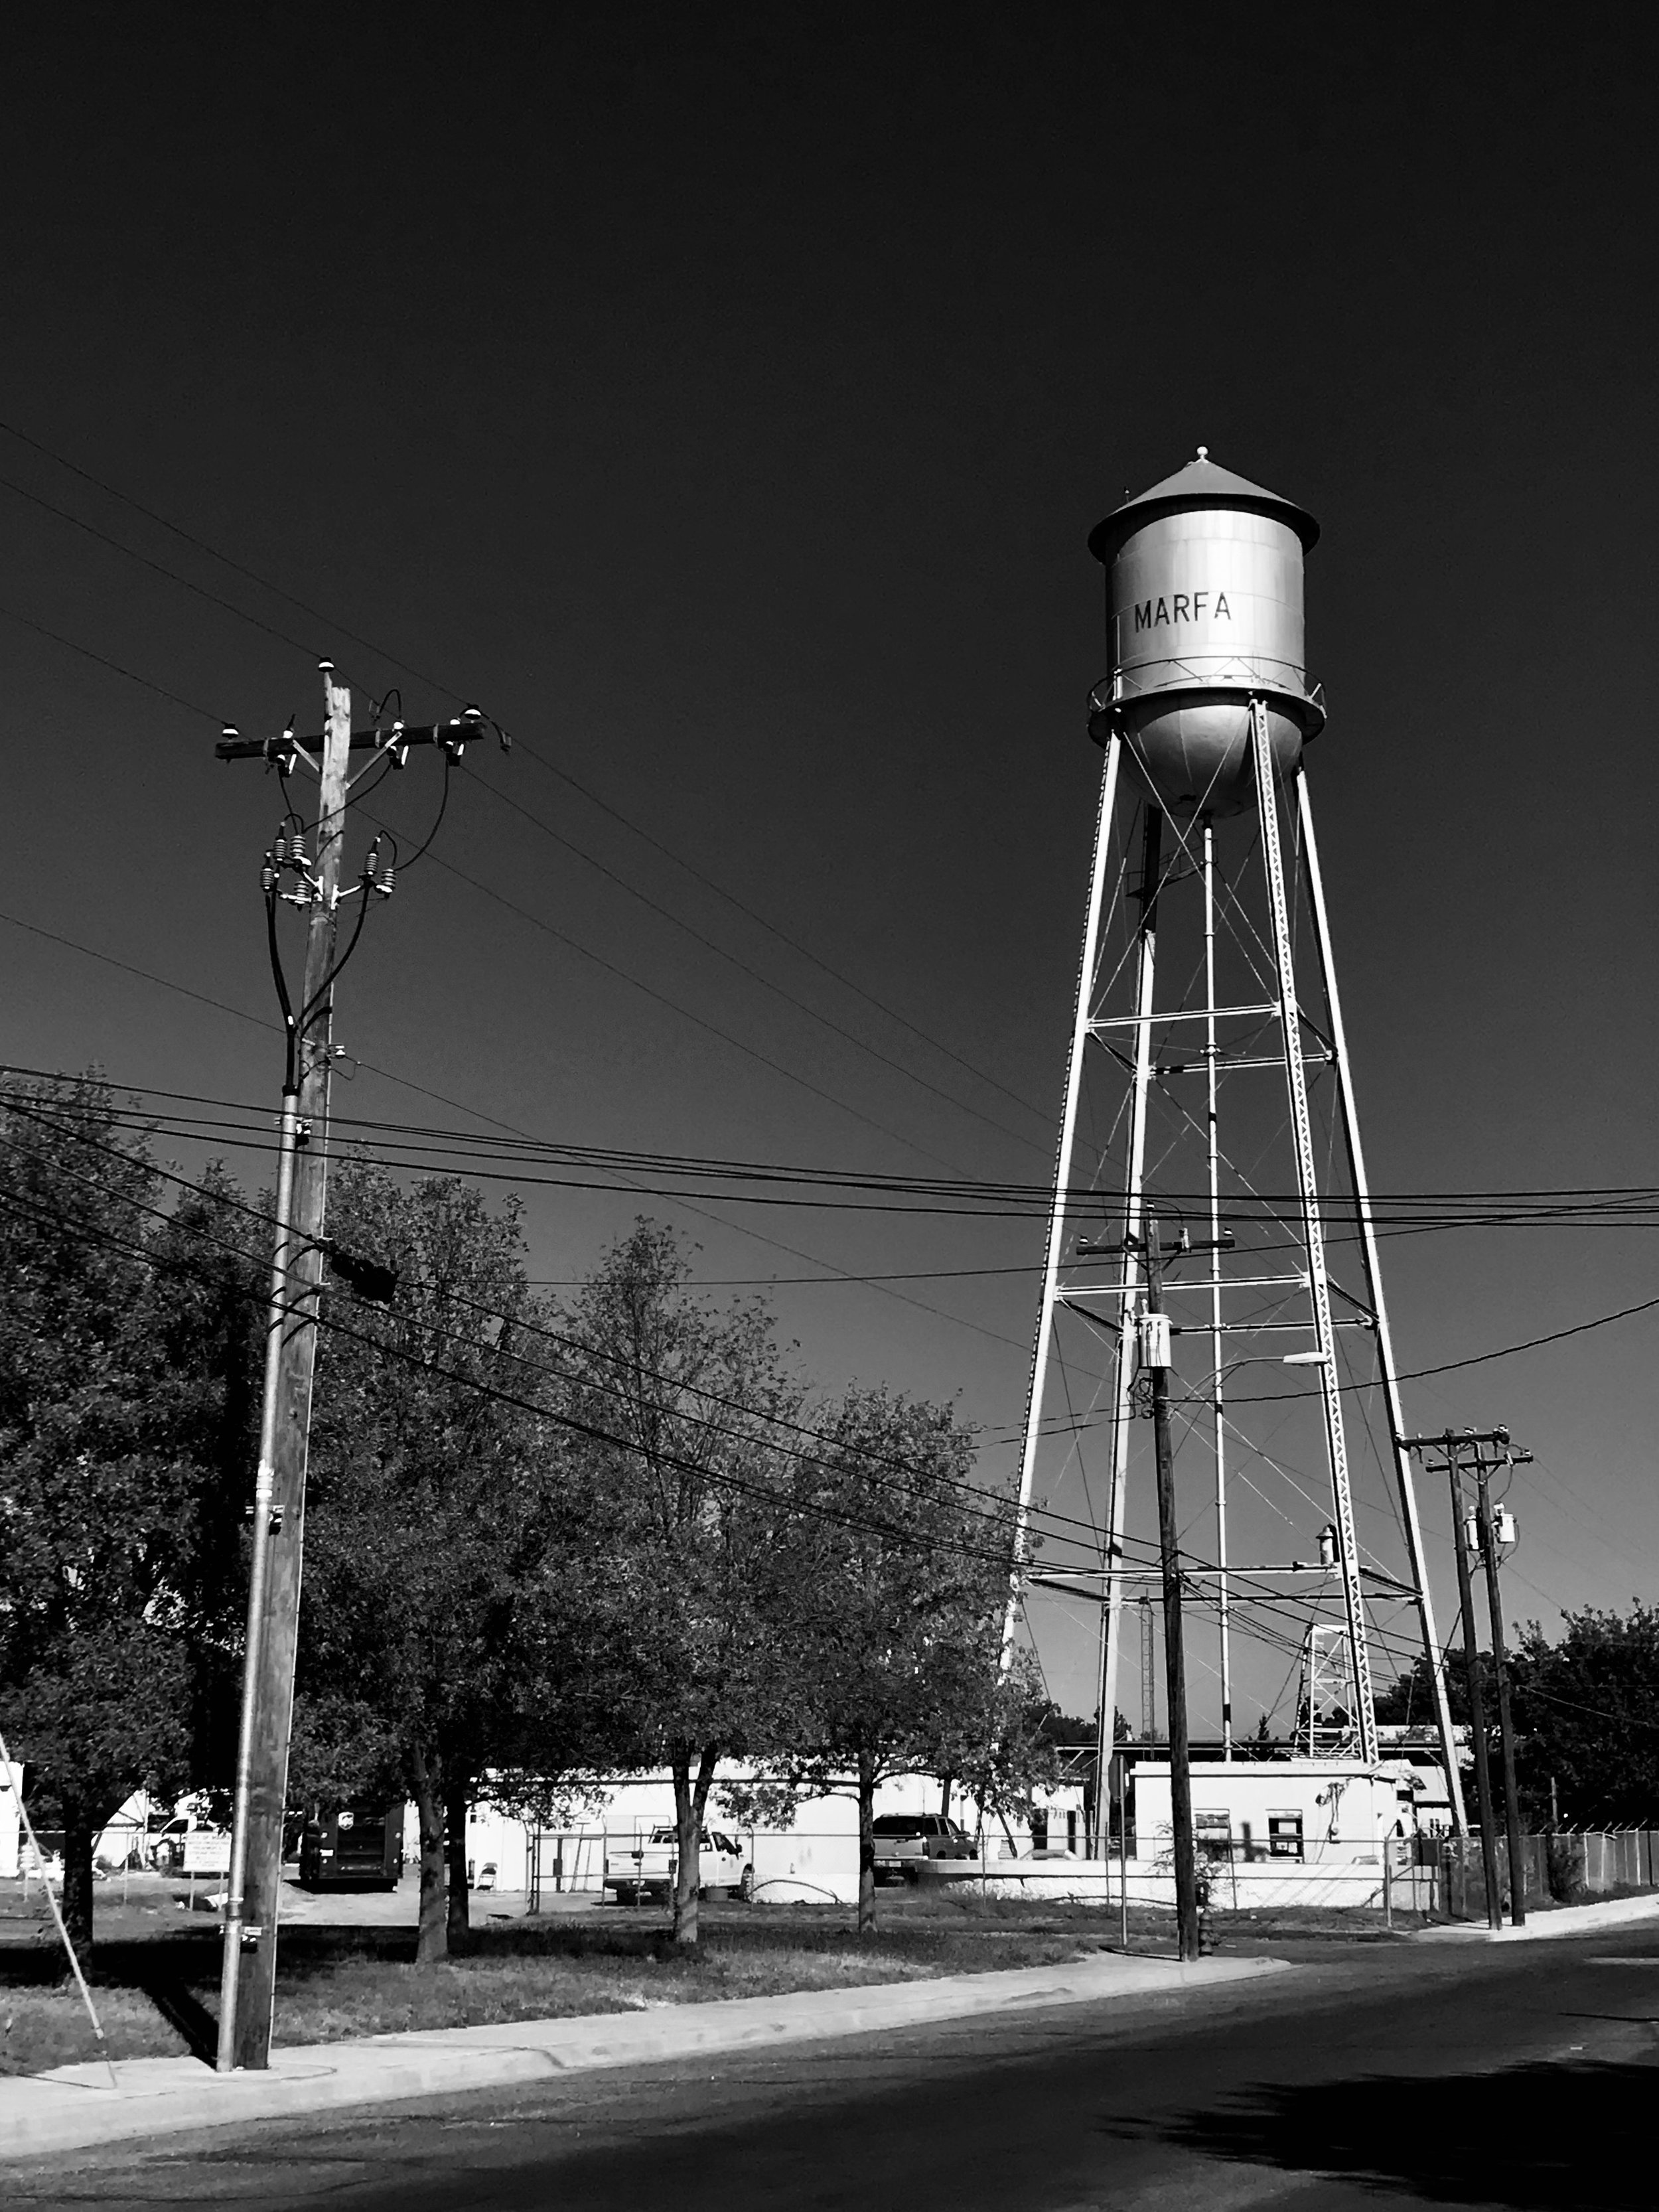 Marfa, TX - 10/2017 - Shot on iPhone 7 Plus